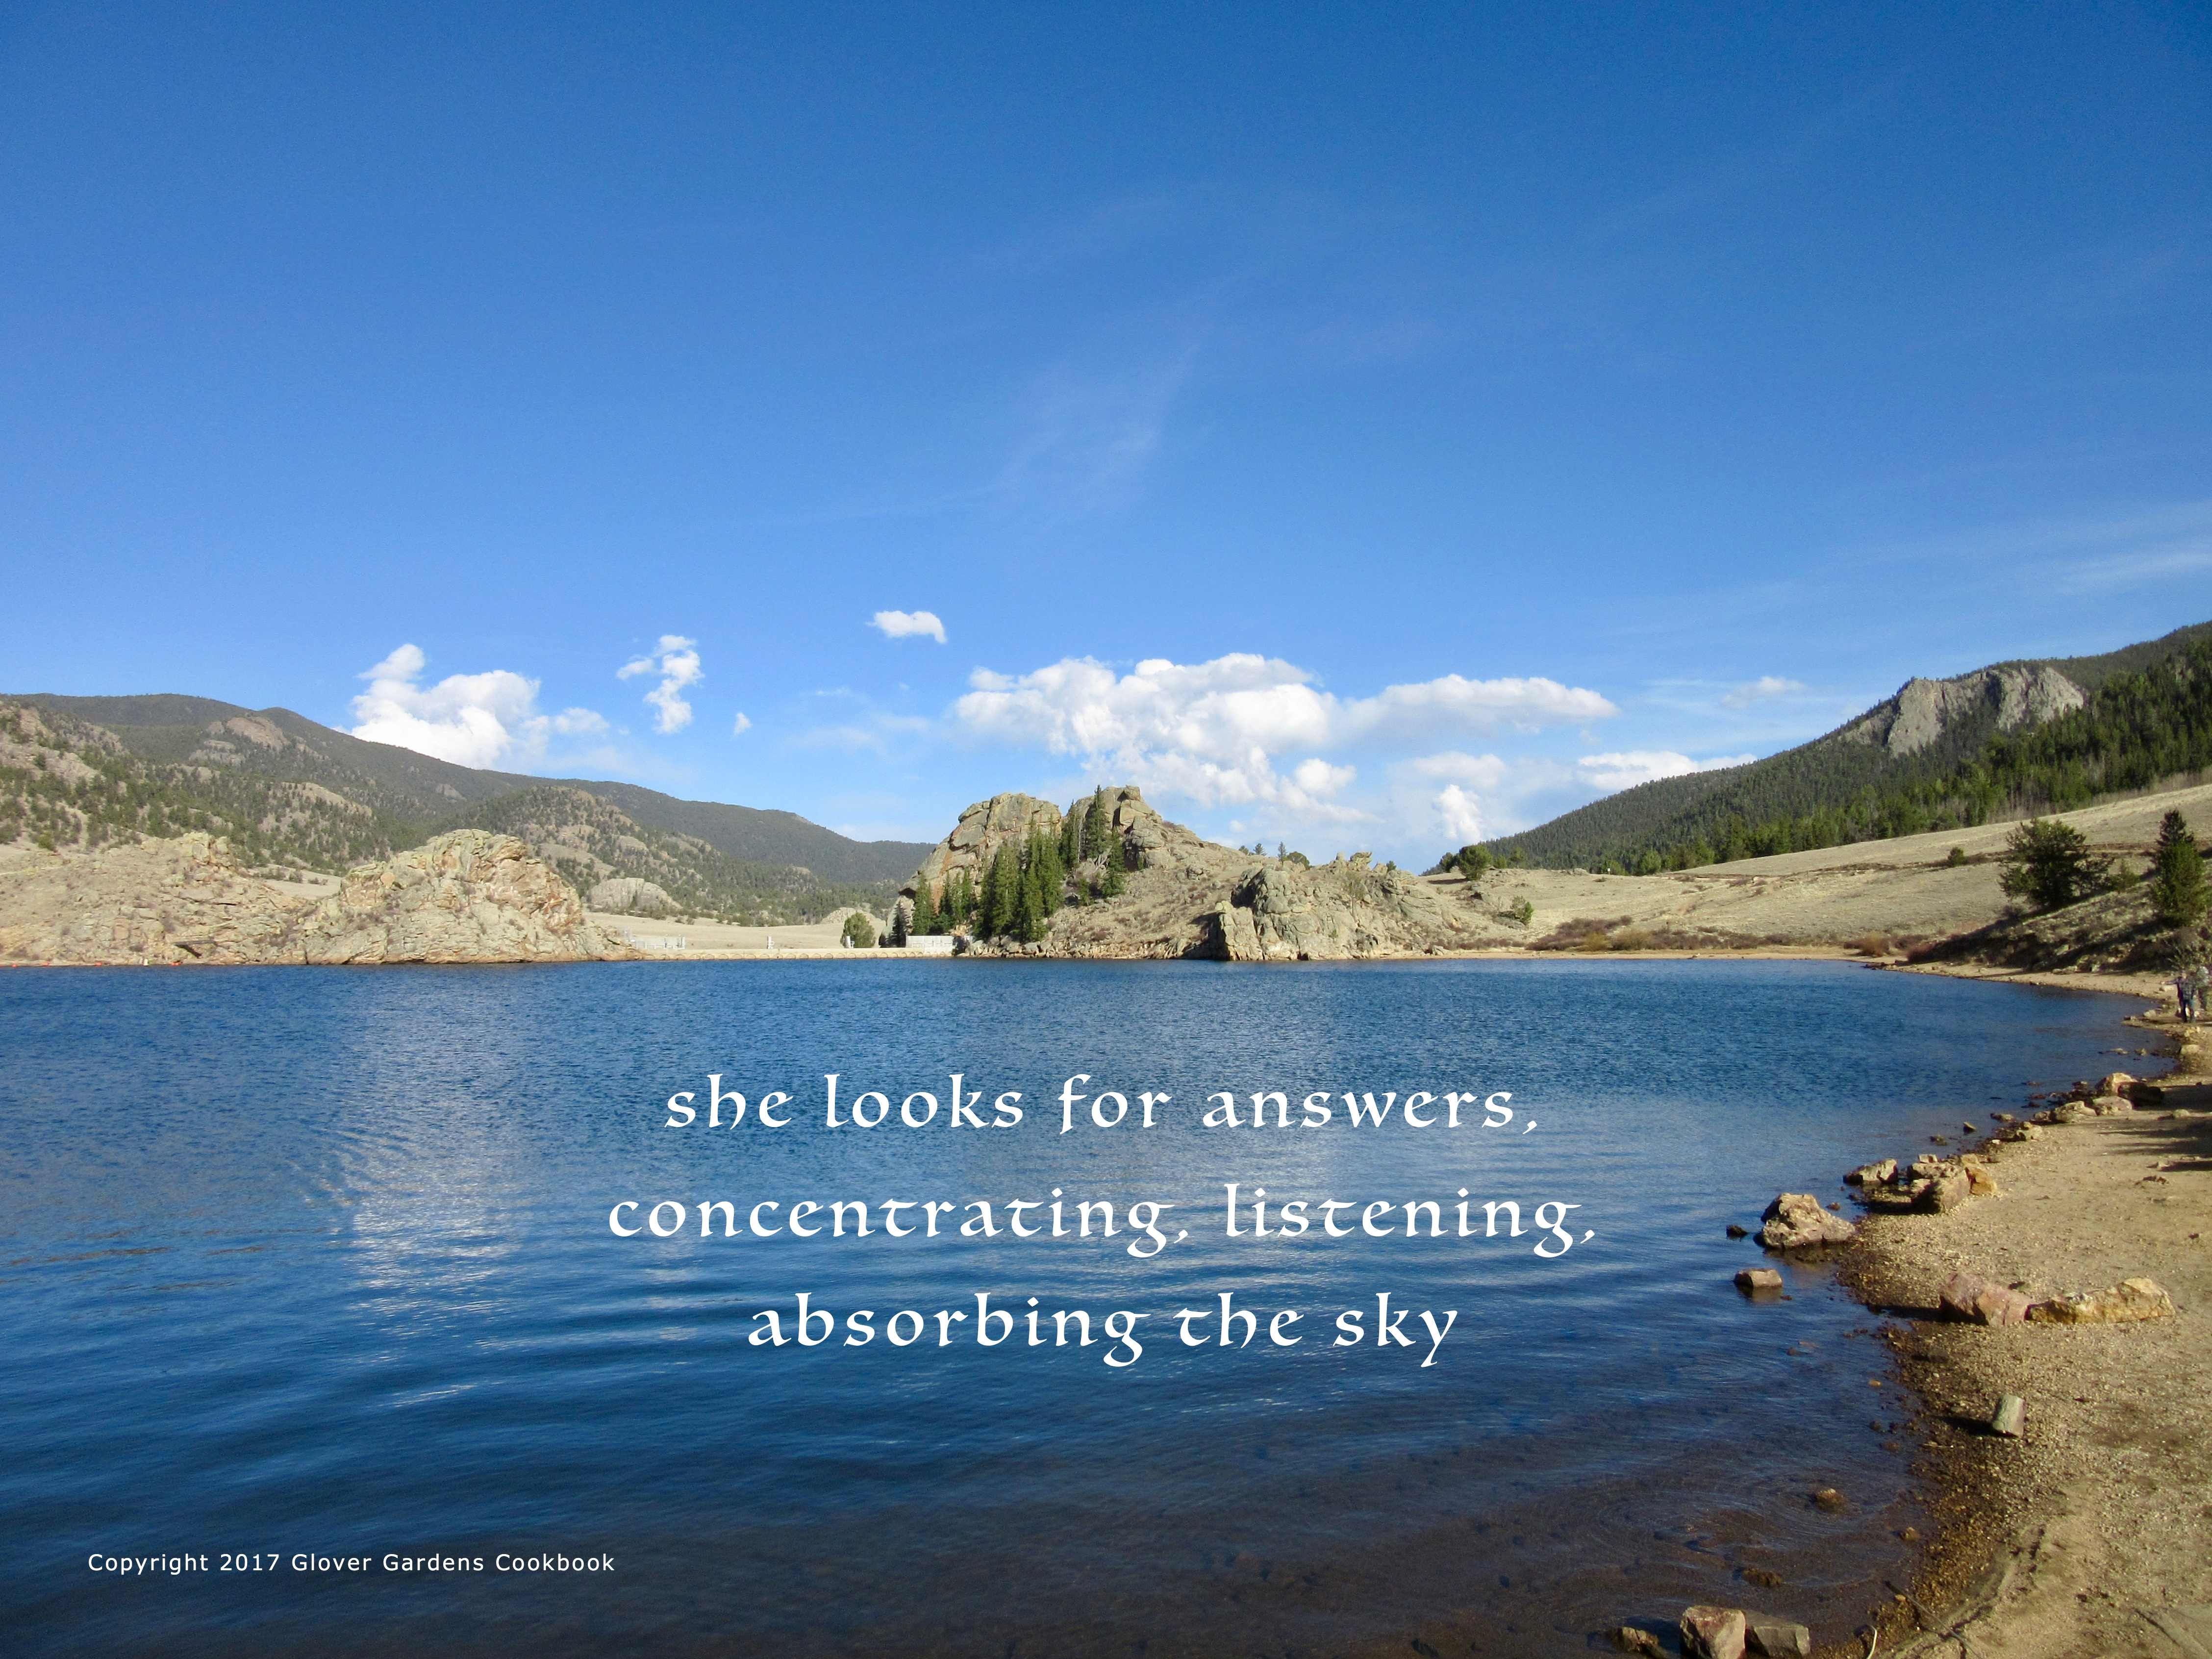 haiku: seeking